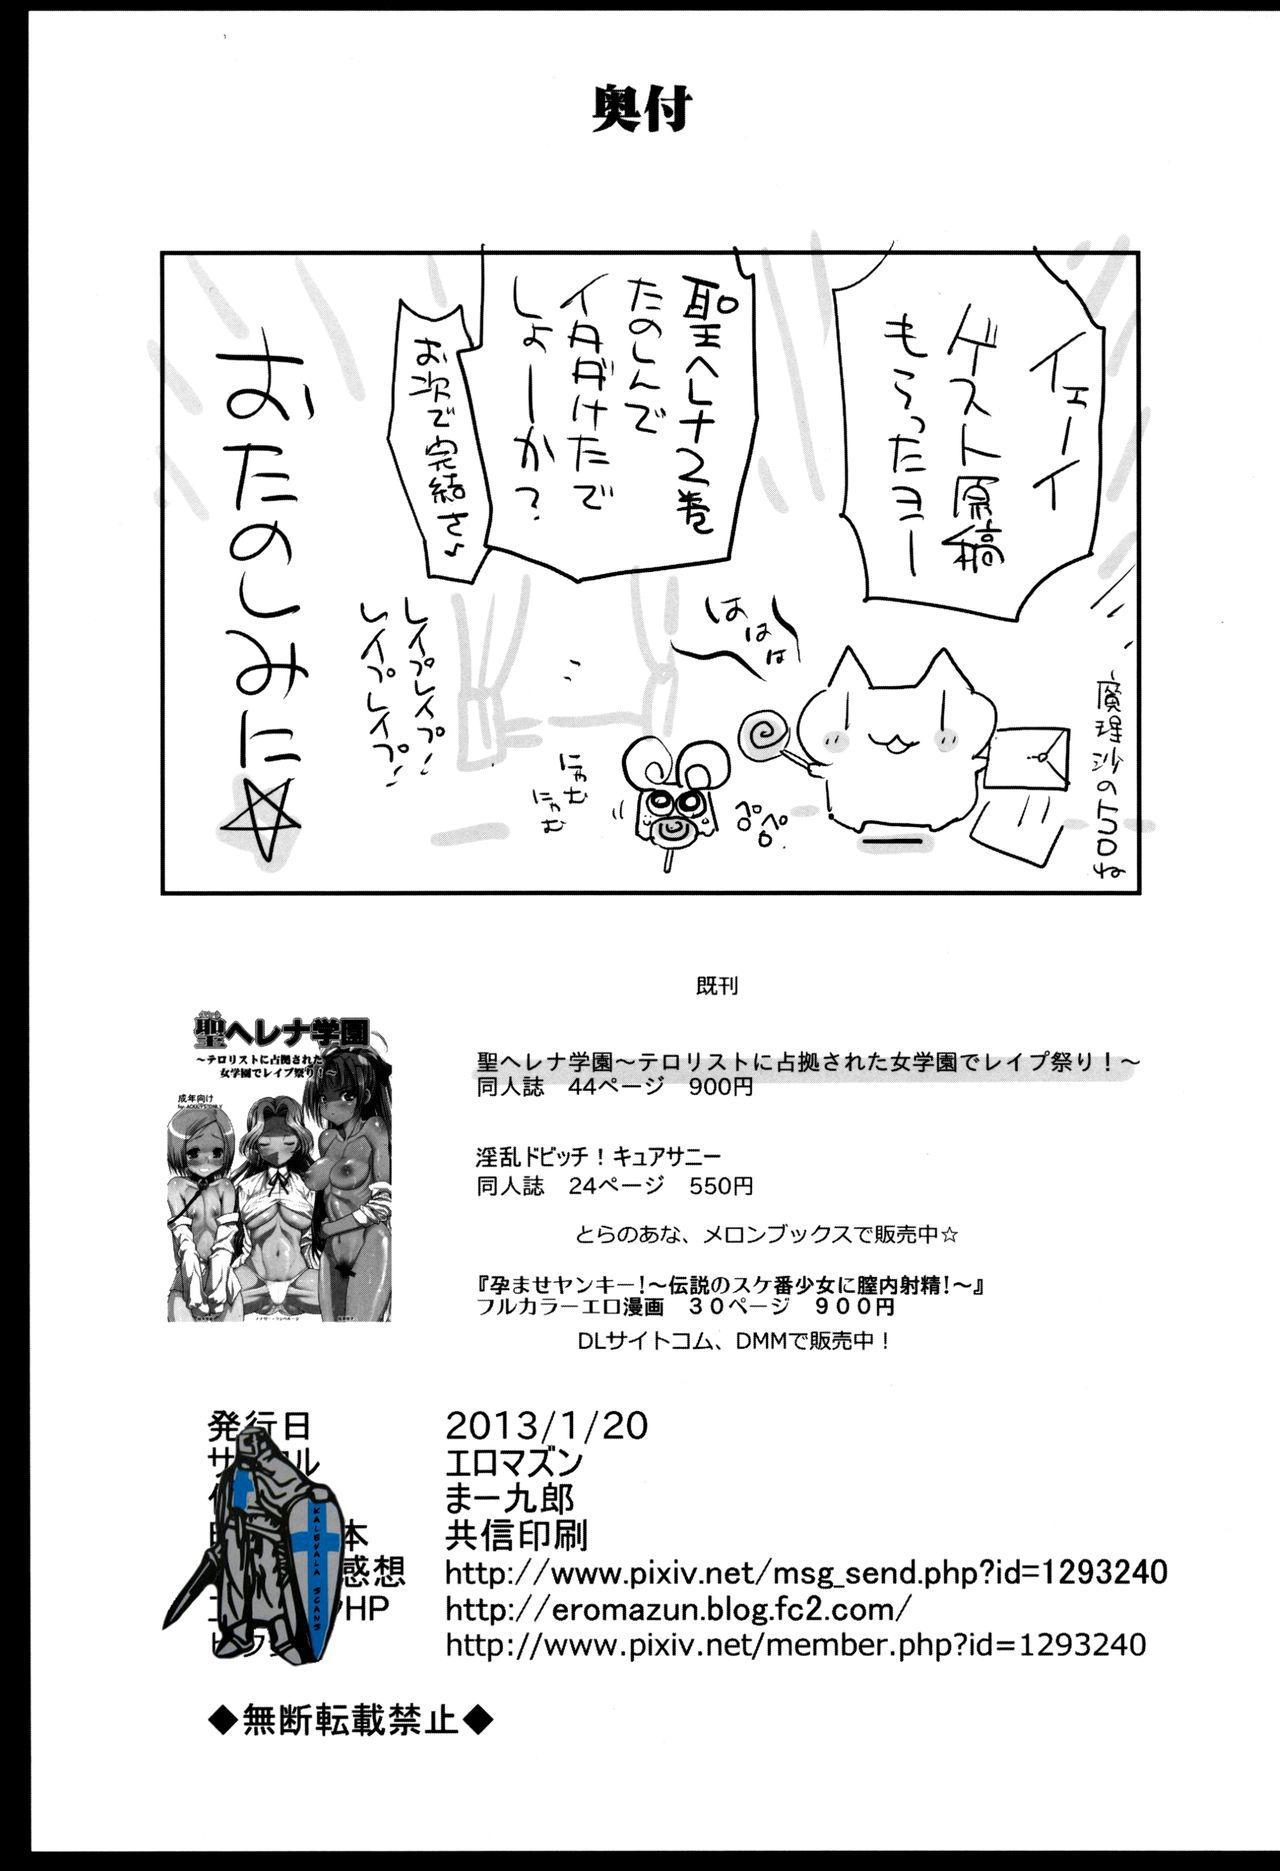 [Eromazun (Ma-Kurou)] Saint Helena Gakuen 2 ~ Terrorist ni Senkyosareta Jogakuen de Rape Matsuri!~   Saint Helena Academy 2 ~A School Occupied by Terrorists Becomes a Rape Festival!~ (Various) [English] [B.E.C. Scans] 44